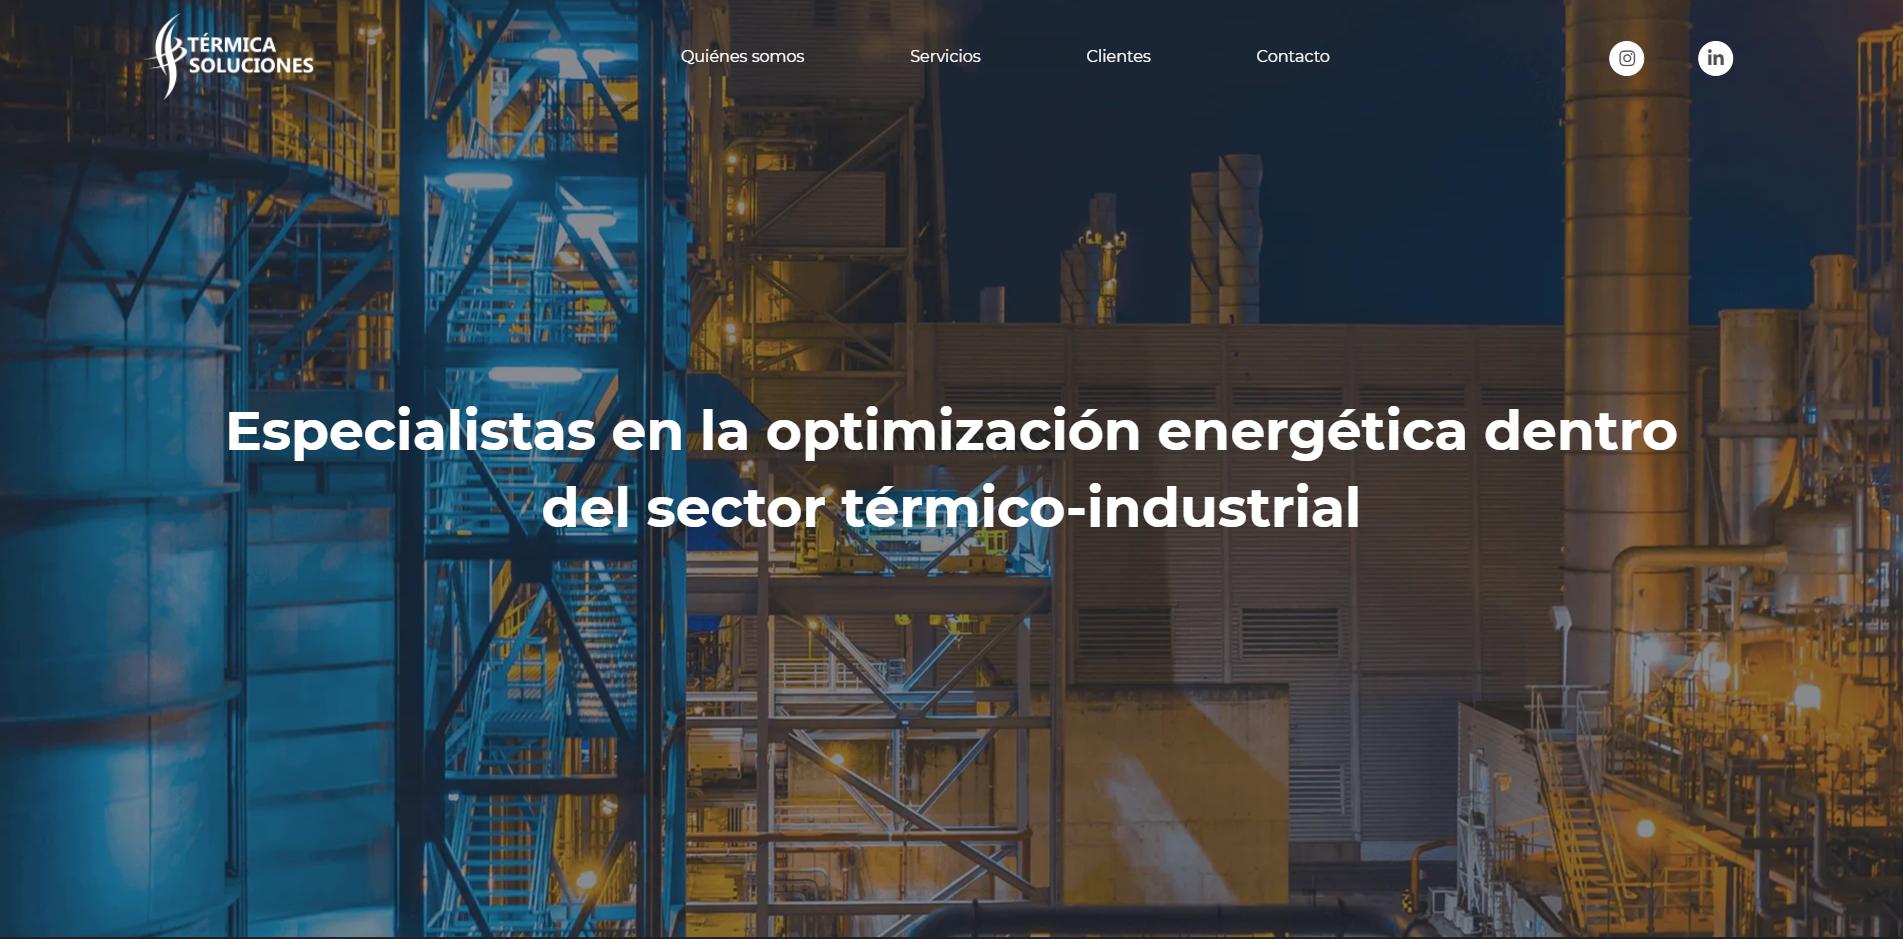 Screenshot of Termica Soluciones website